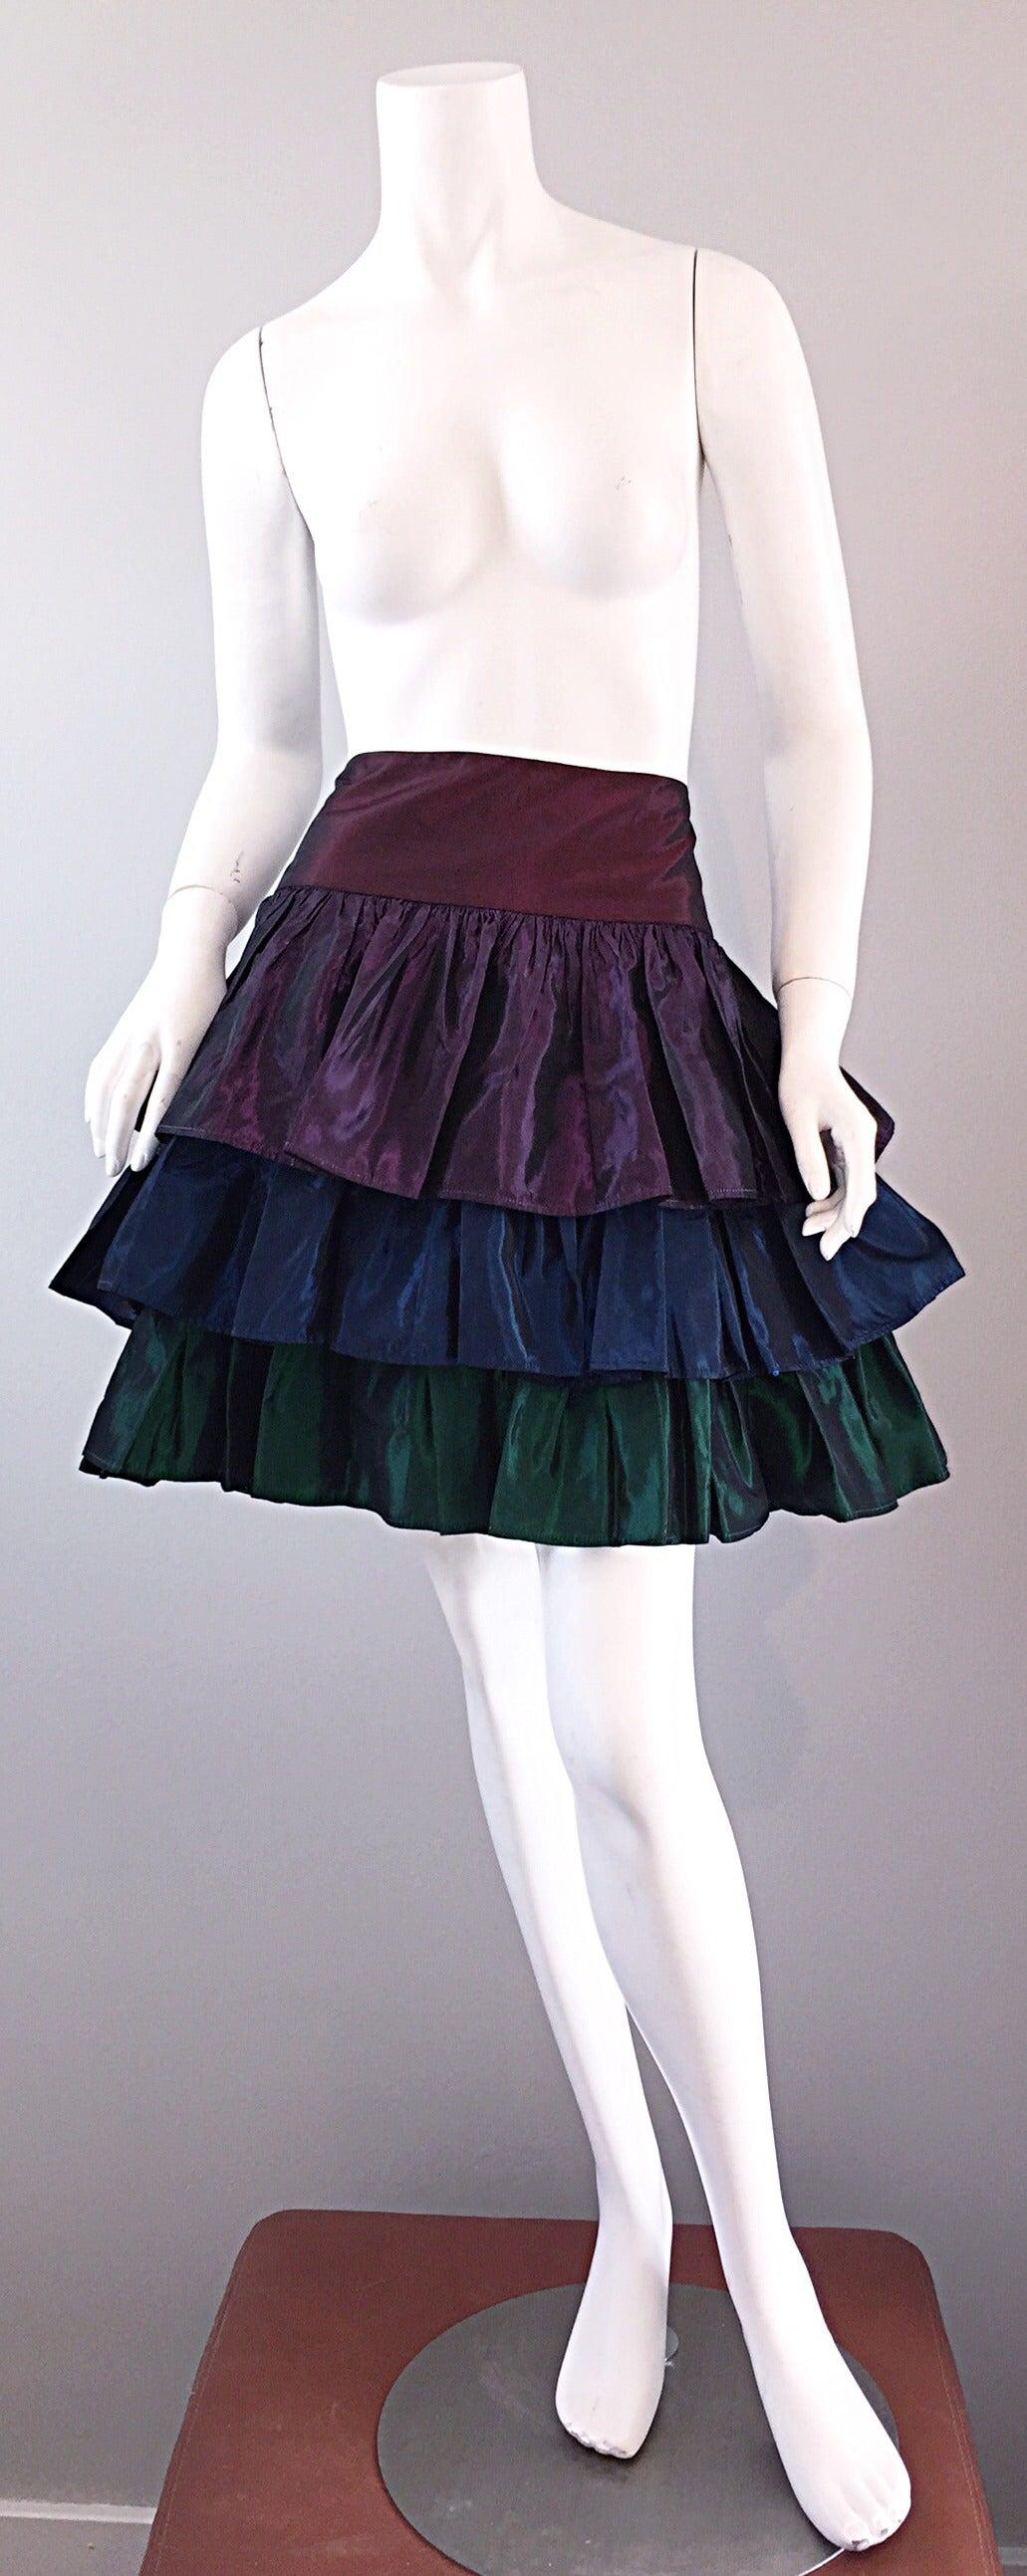 Kalinka For Bergdorf Goodman Tiered Taffeta ' Rainbow ' Vintage Skirt 9